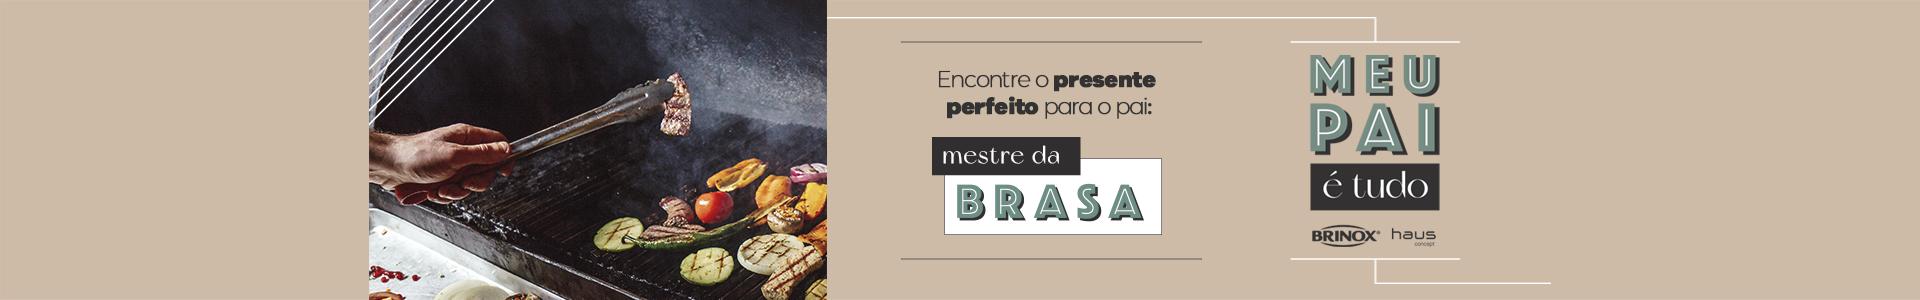 banner_landing_brasa_pais